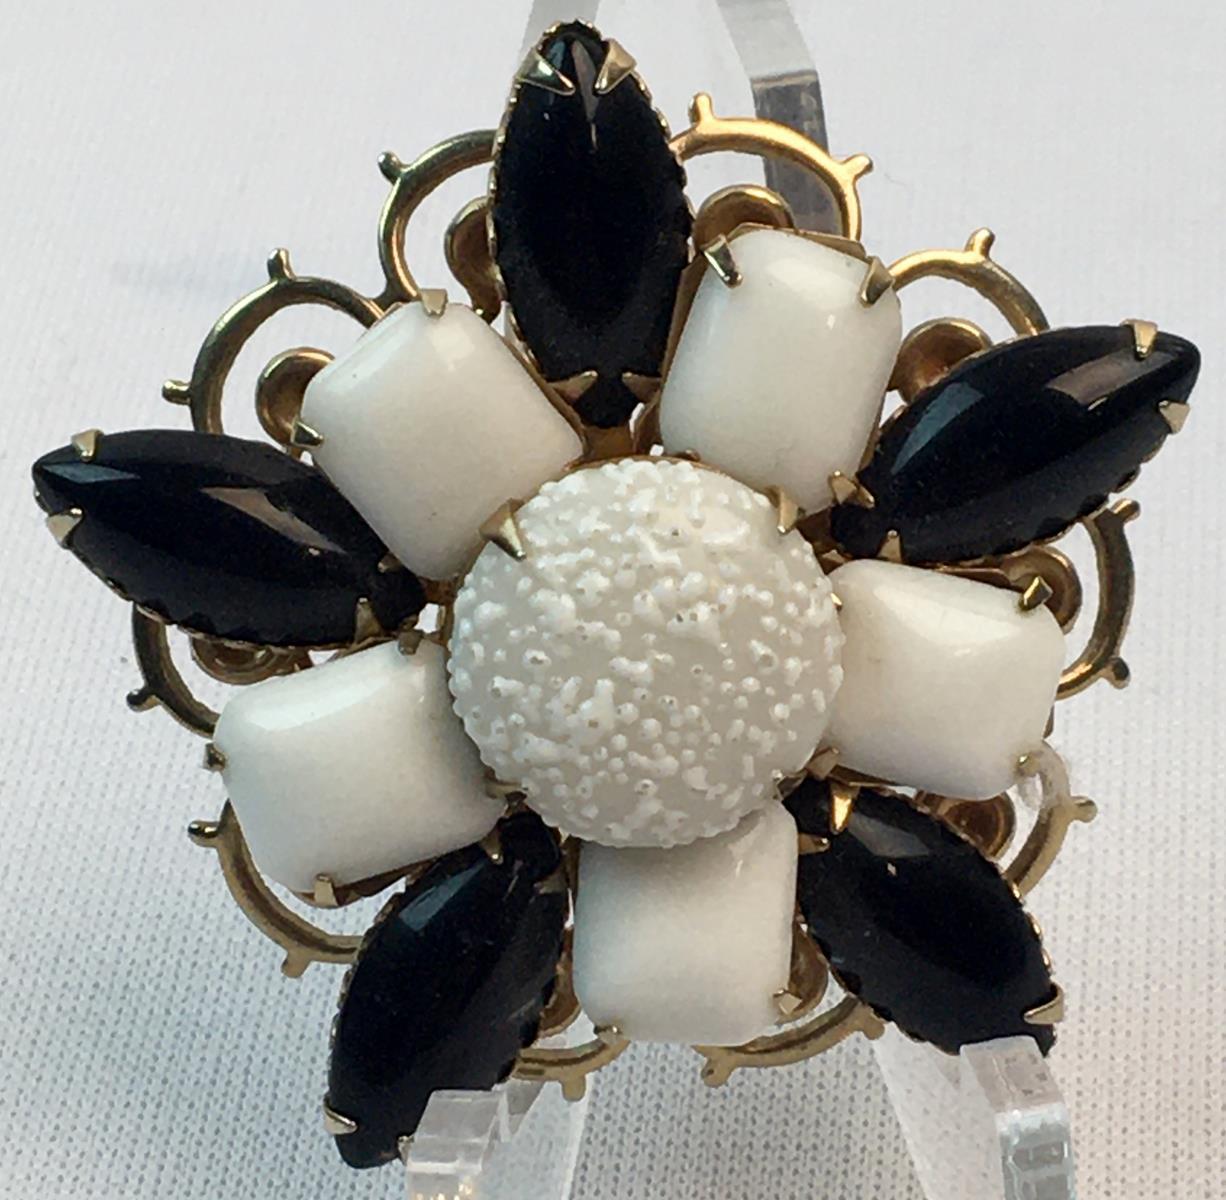 Vintage Gold Tone Floral Brooch w/ Milk Glass & Black Stones